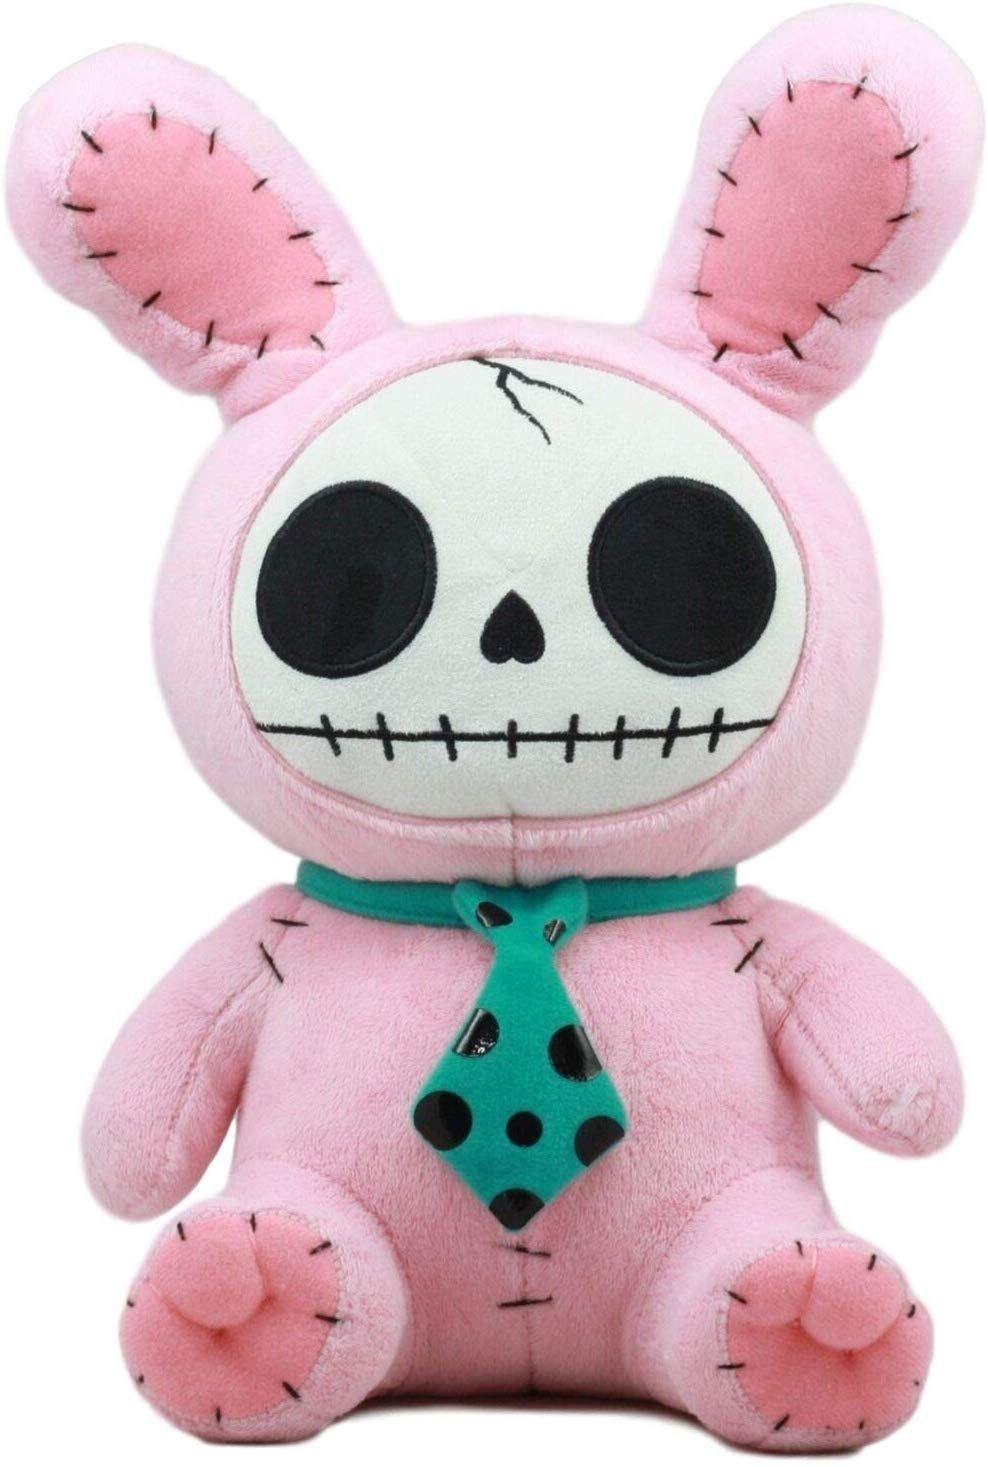 • The Pink Bunny Furry Bones Plush Doll measures 12